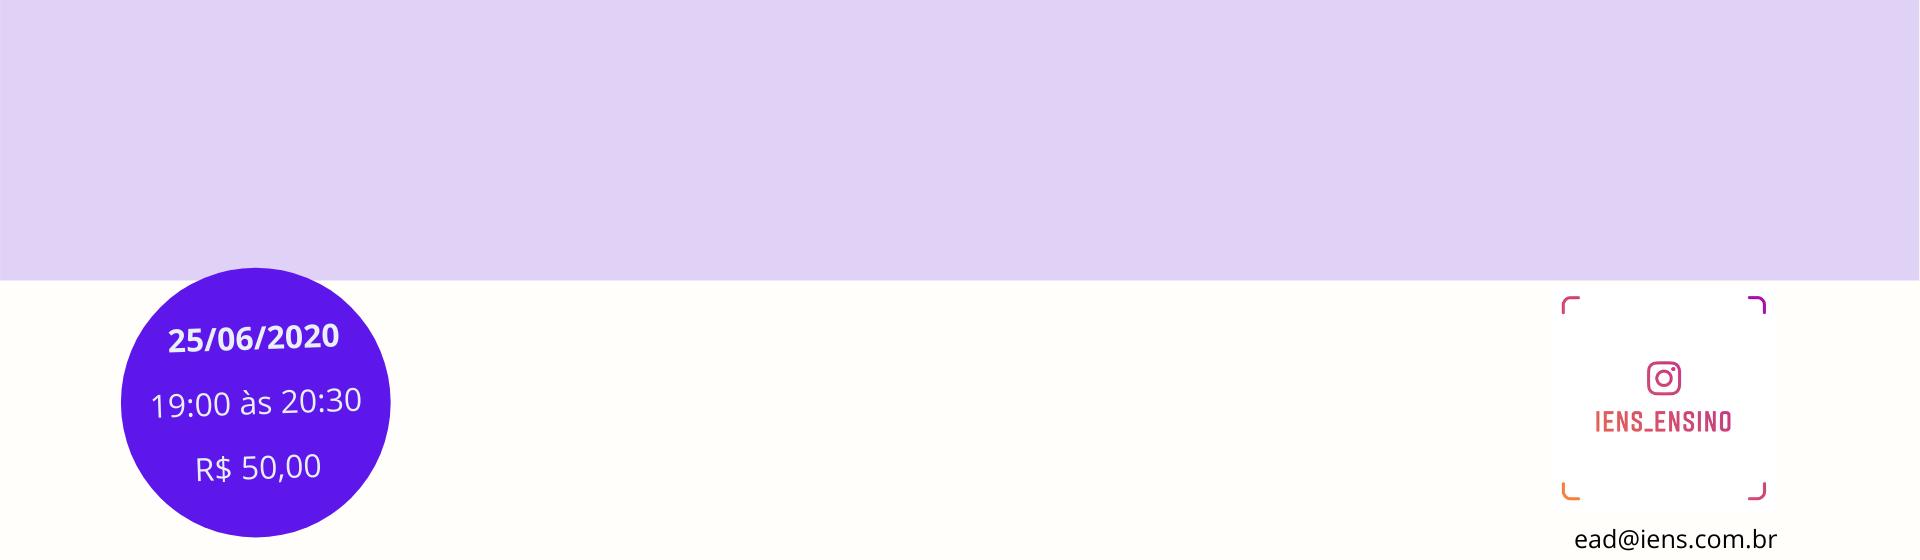 Banner%2beadbox%2b 1